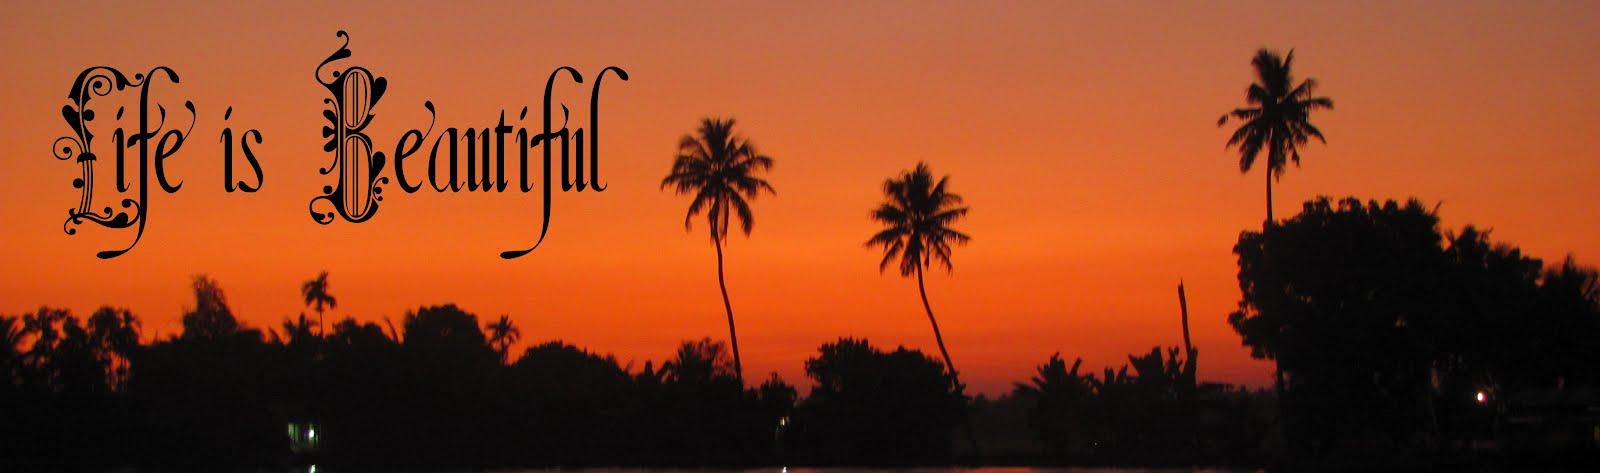 Life is Beautiful!